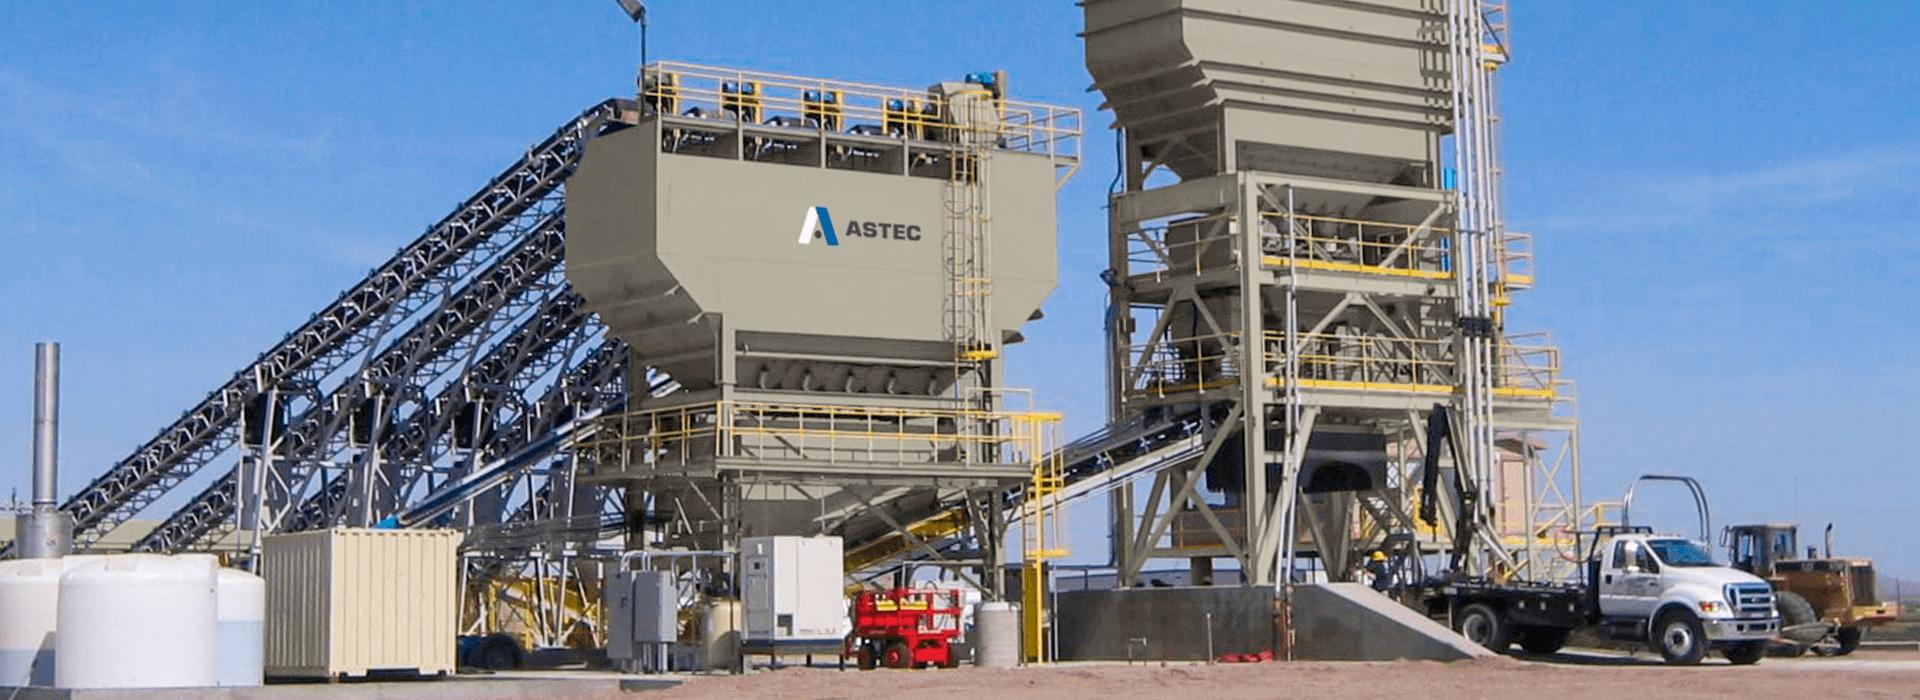 Astec BMH EG Dry Batch Concrete Plant